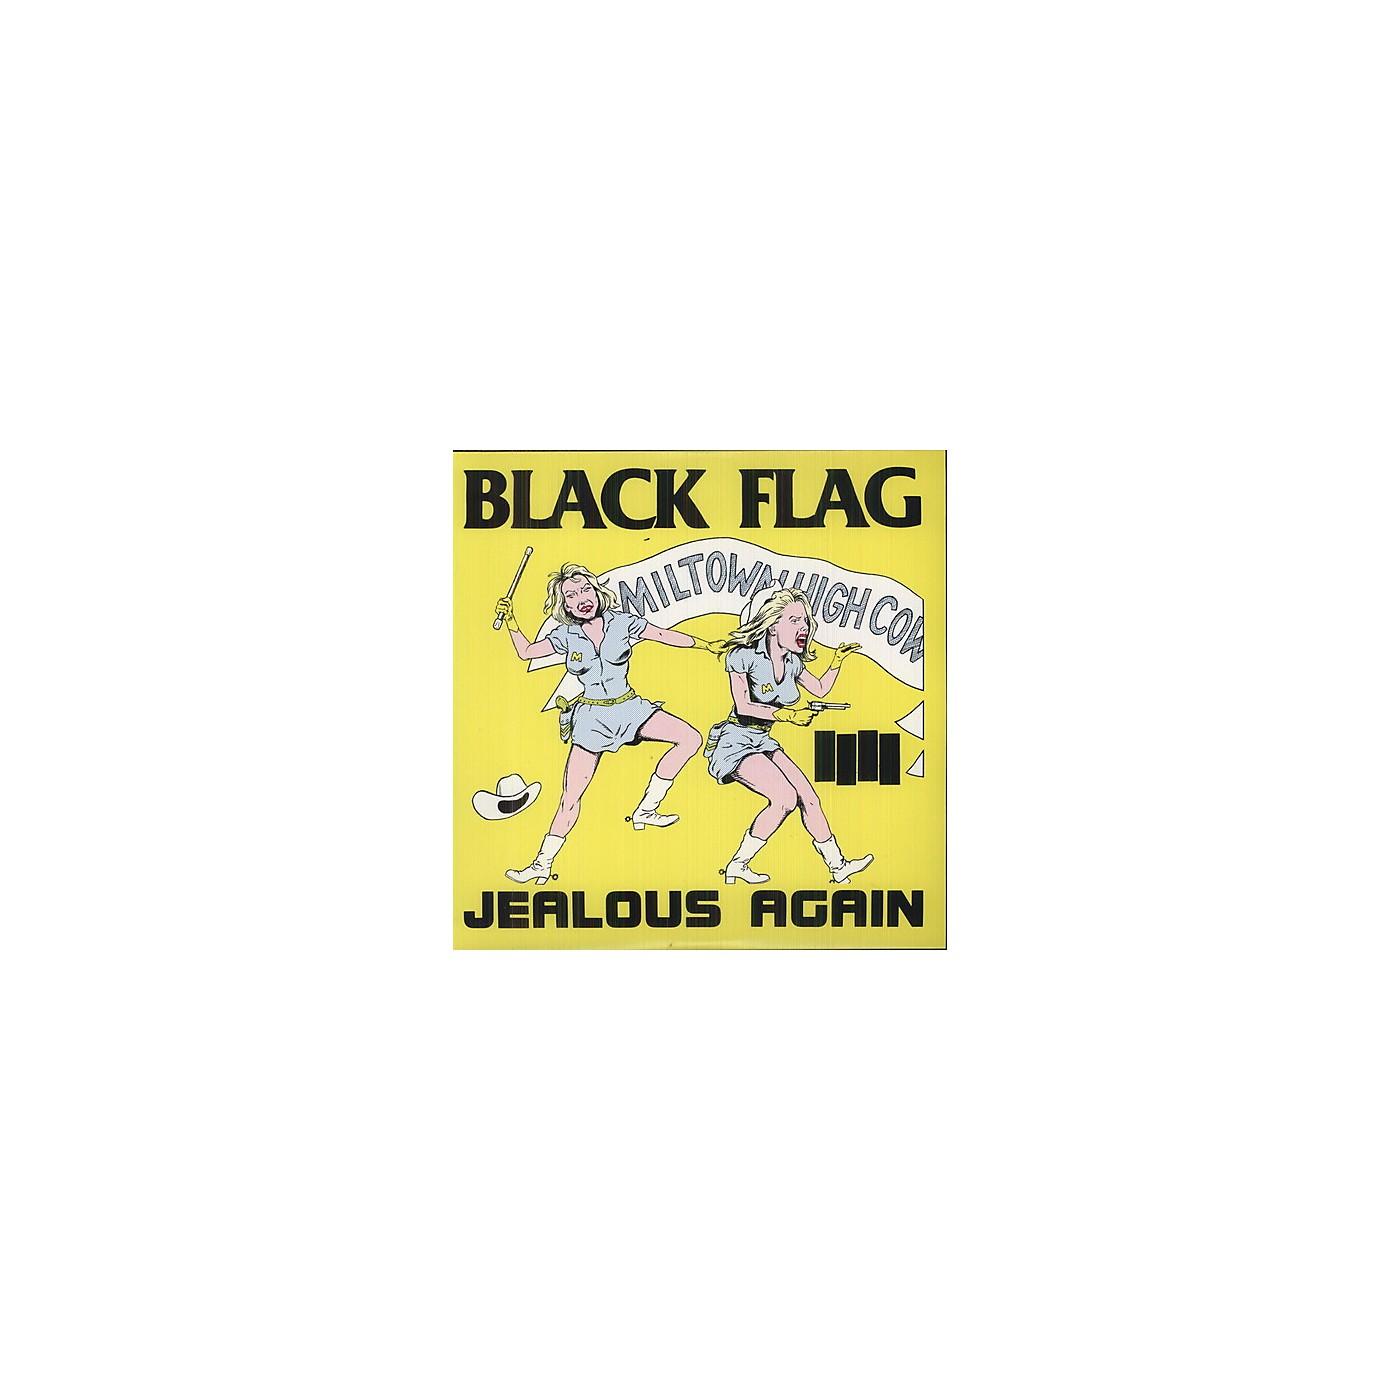 Alliance Black Flag - Jealous Again thumbnail